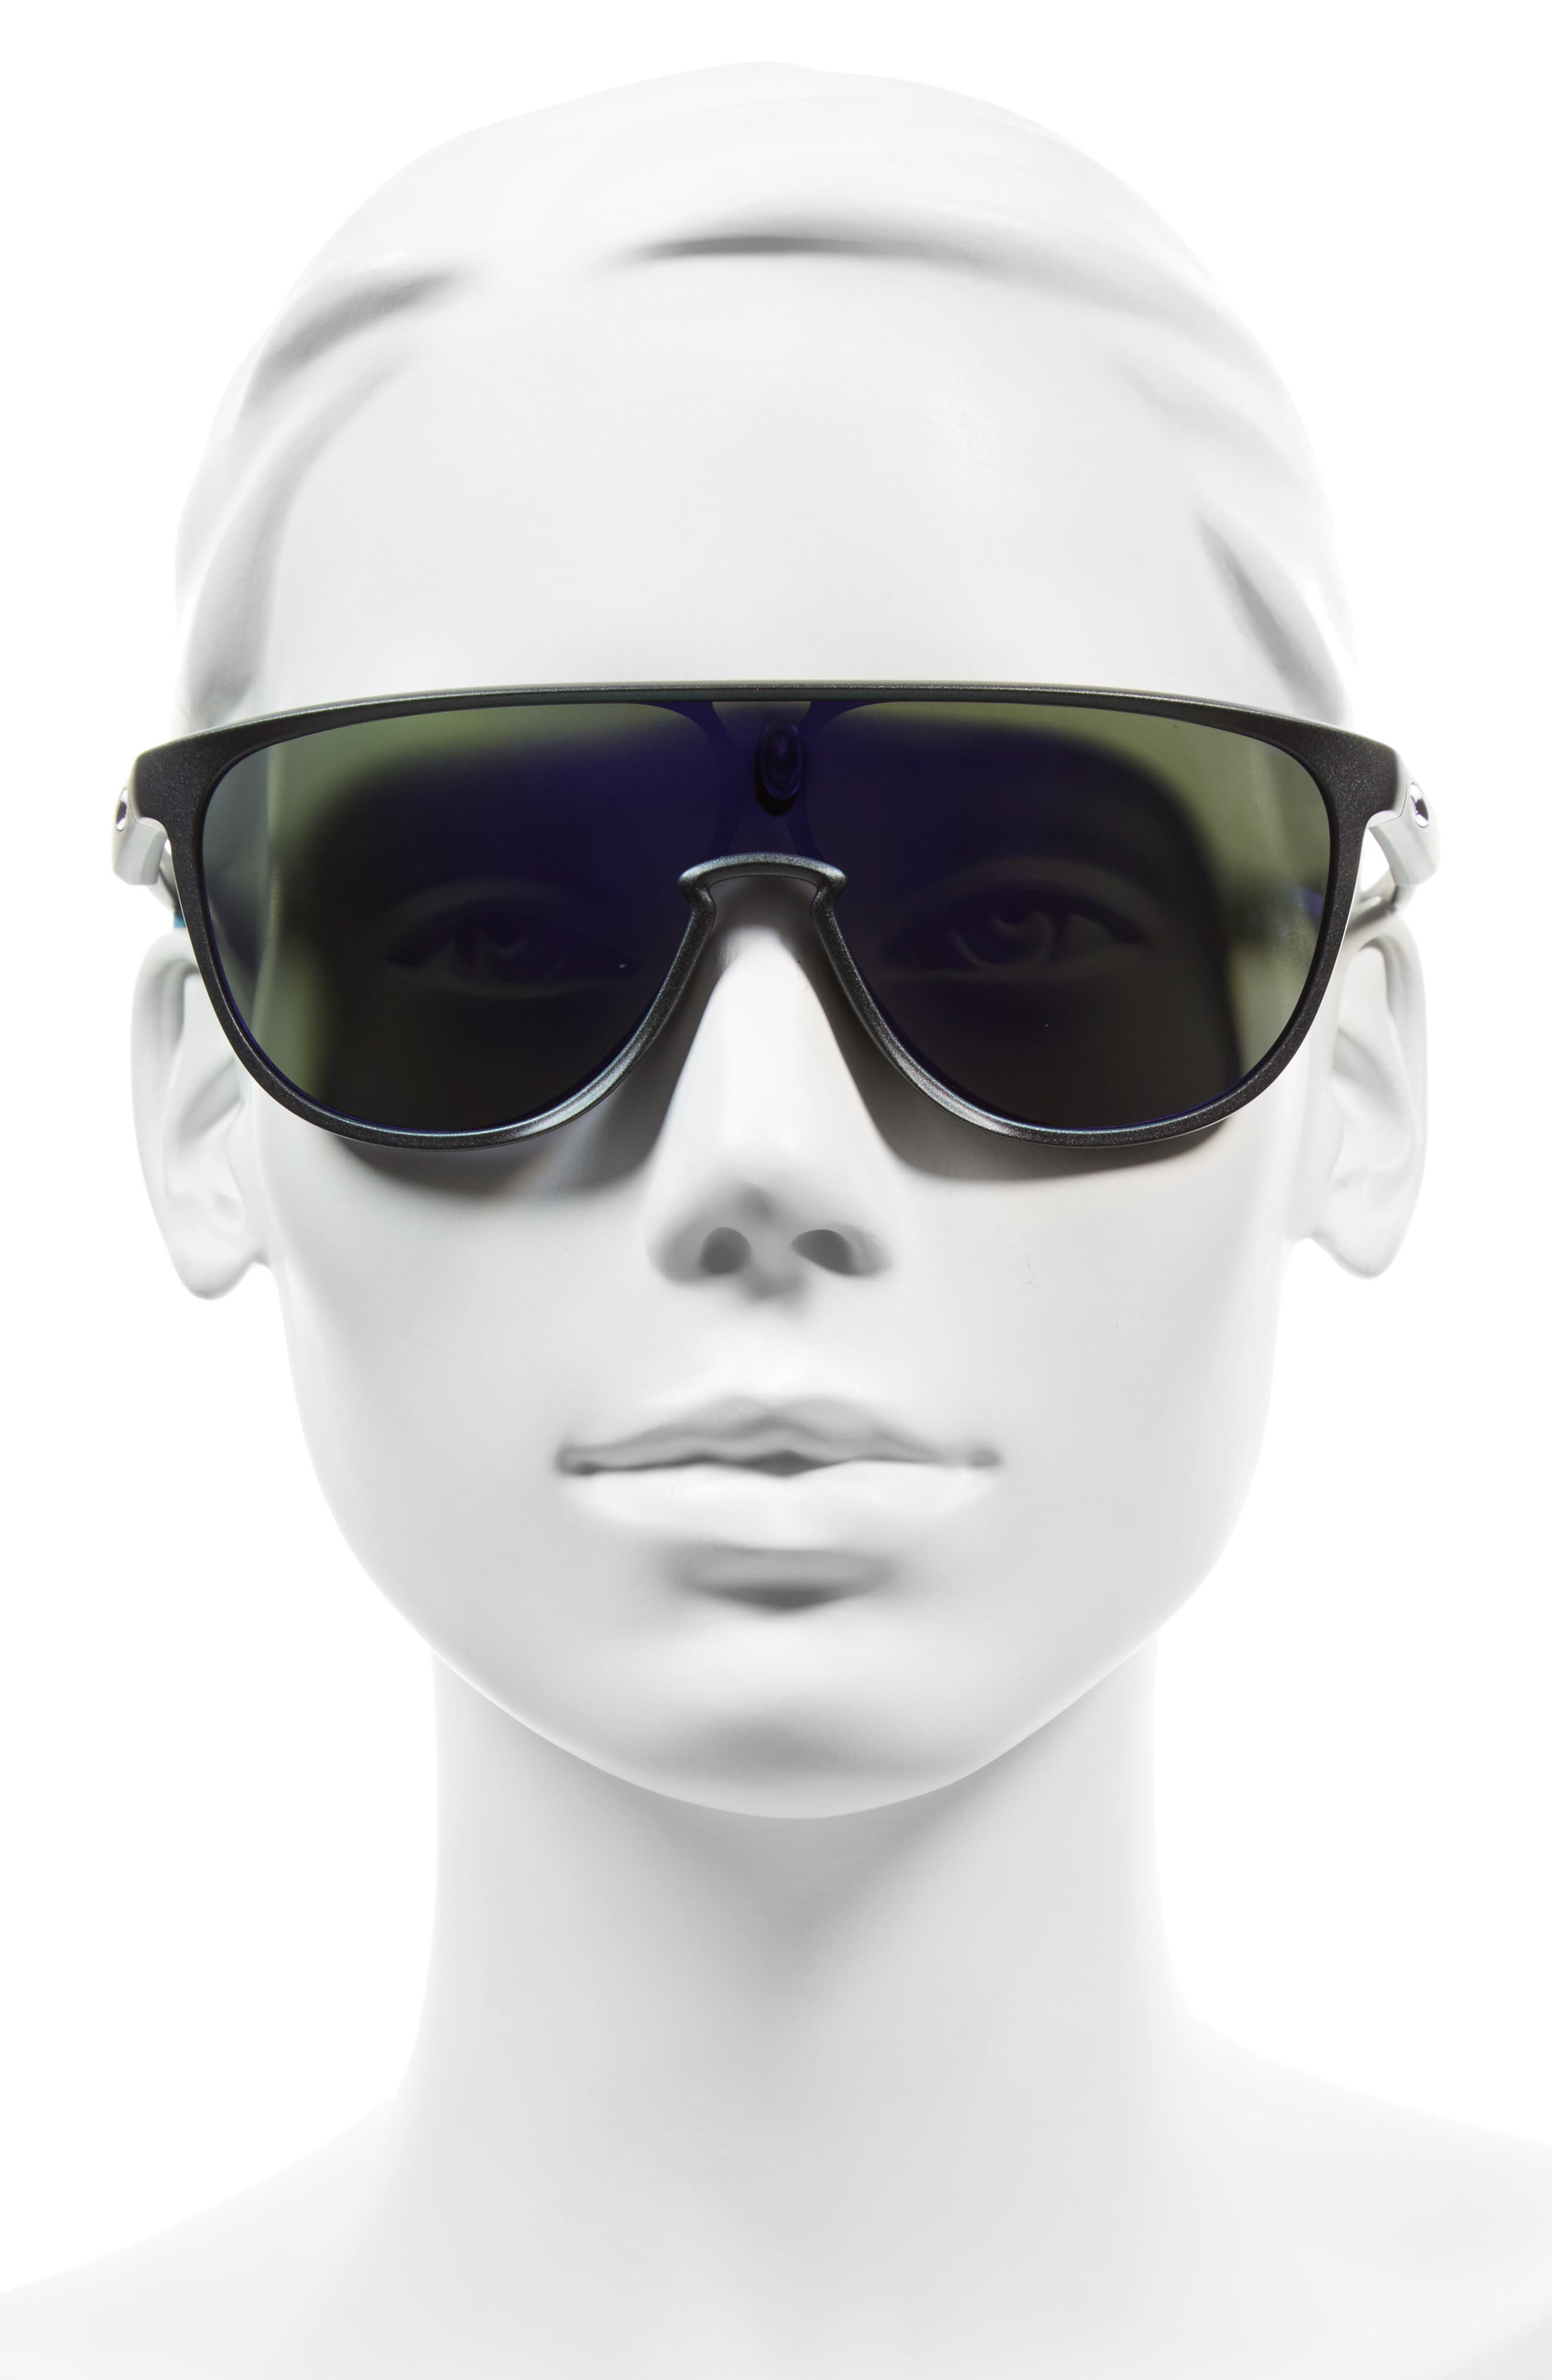 Trillbe 140mm Shield Sunglasses,                             Alternate thumbnail 2, color,                             Steel/ Violet Iridium